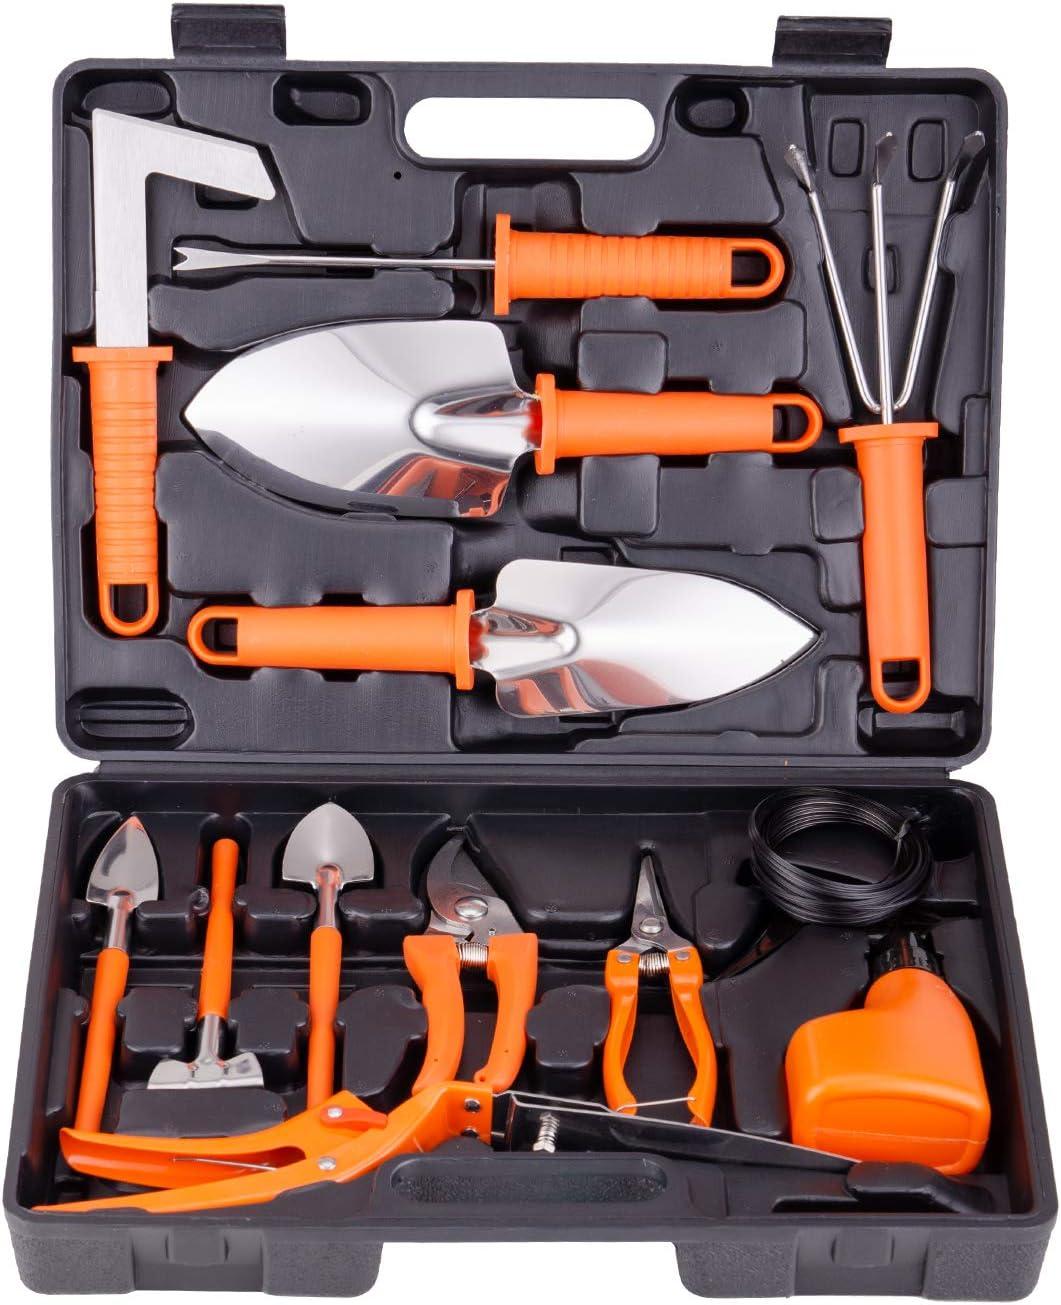 BNCHI Gardening Tools Set,14 Pieces Stainless Steel Garden Hand Tool, Gardening Gifts for Women,Men,Gardener 14 Pieces-Orange